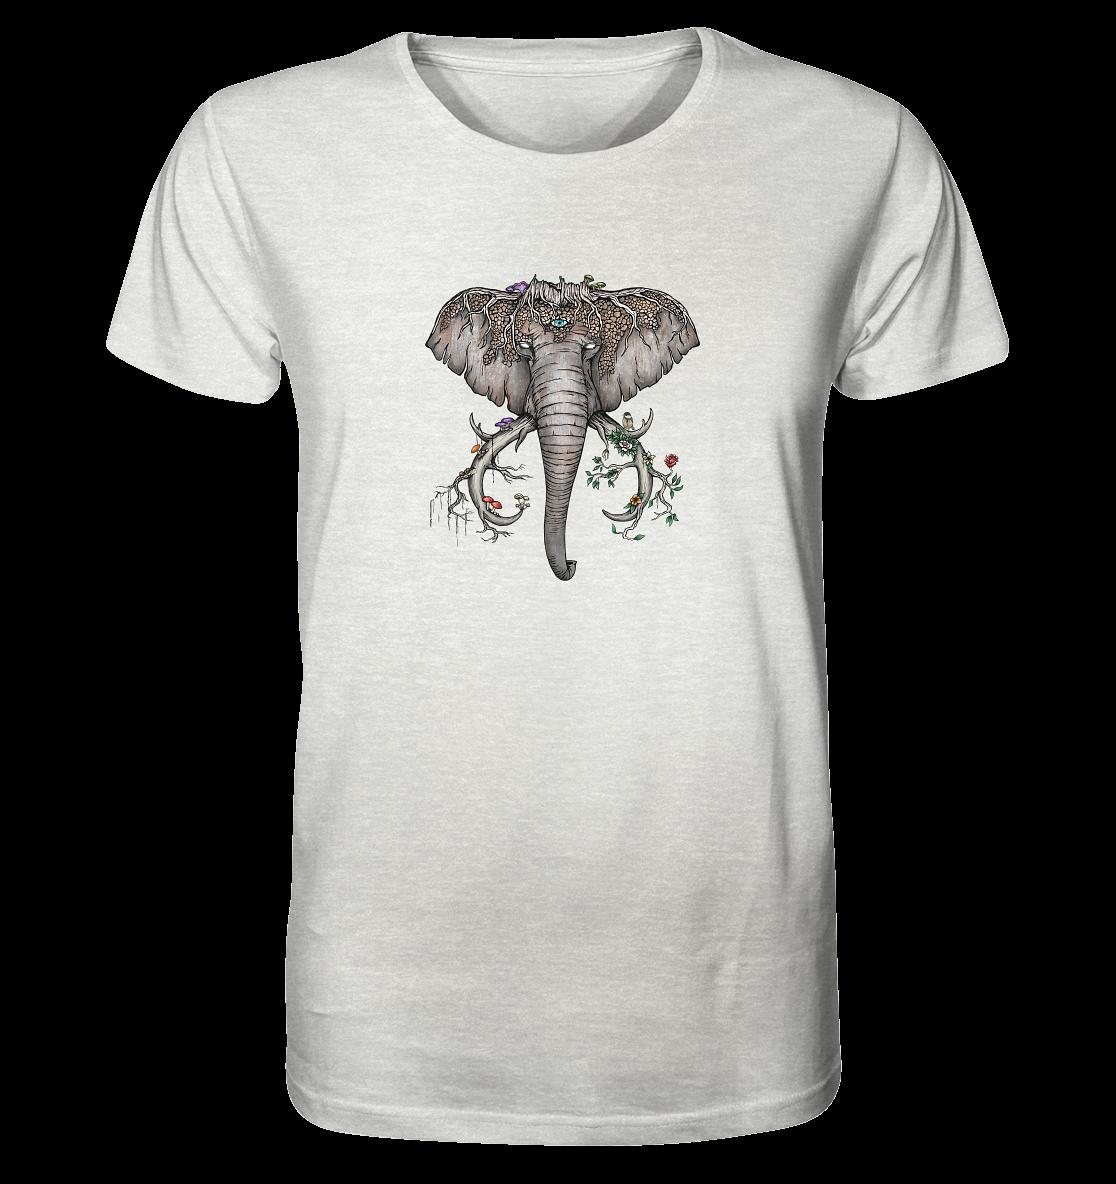 front-organic-shirt-meliert-f2f5f3-1116x-2.png